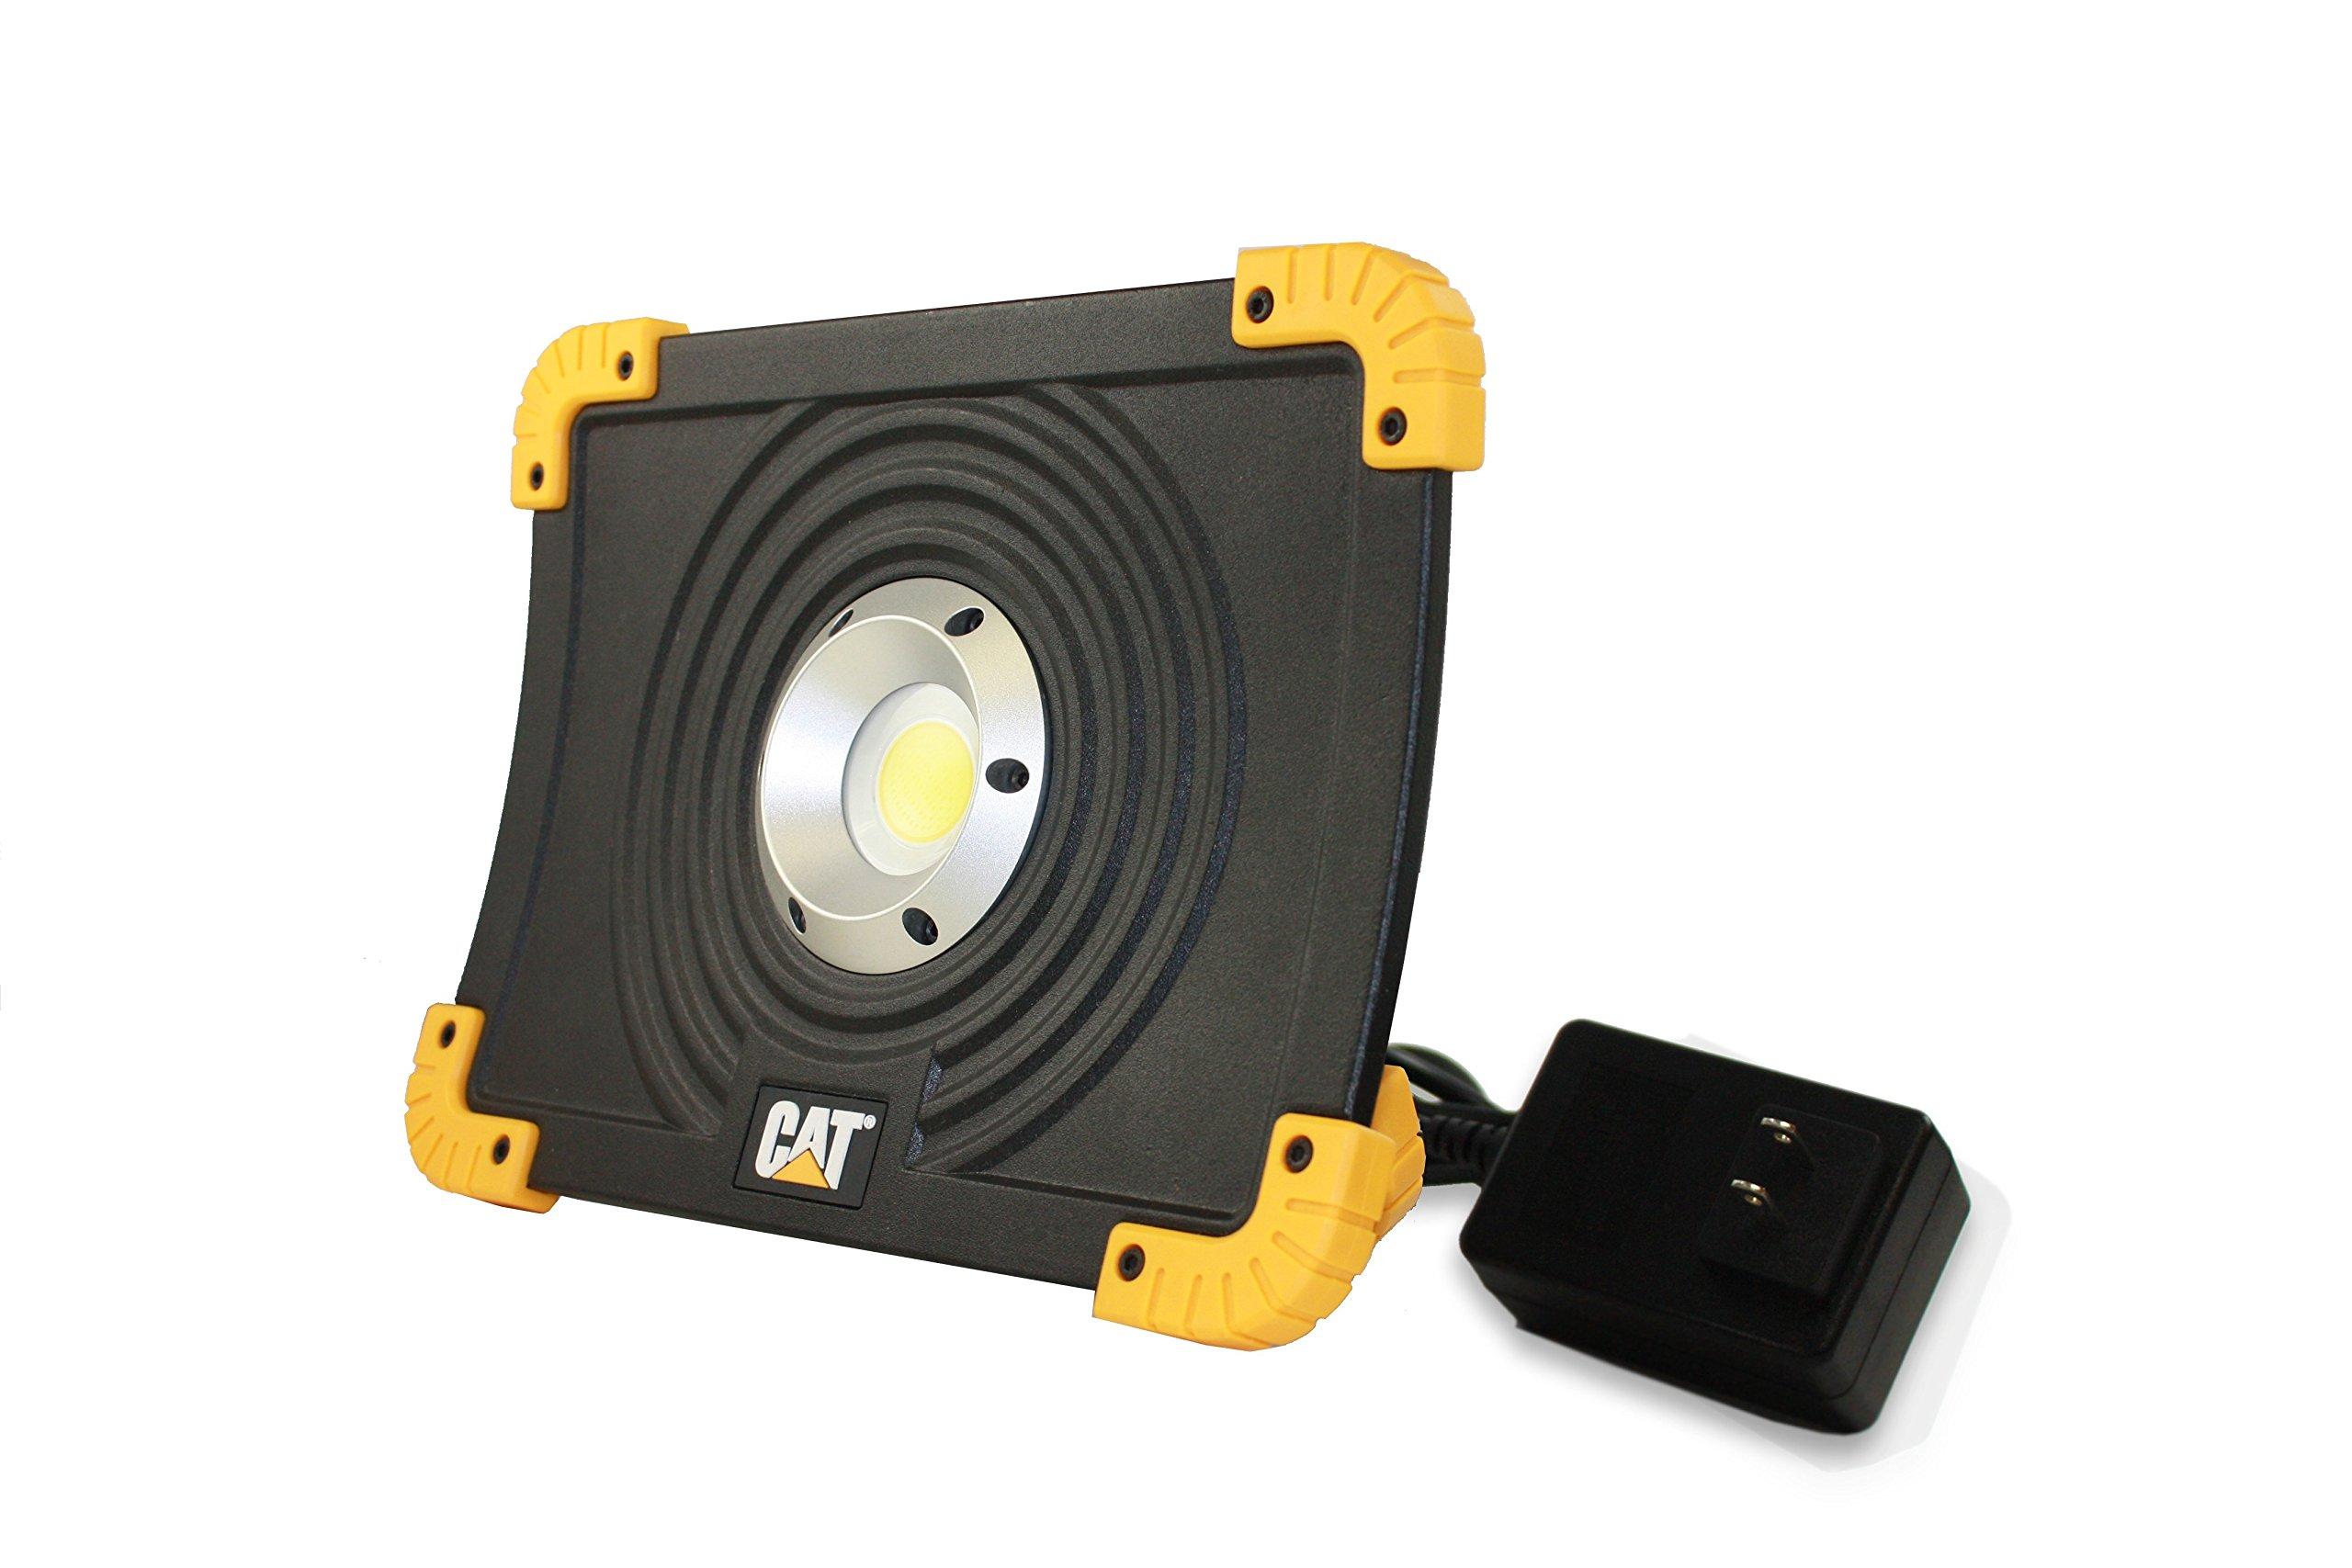 CAT CT3530 3000 lm LED Portable Work Light, Yellow/Black